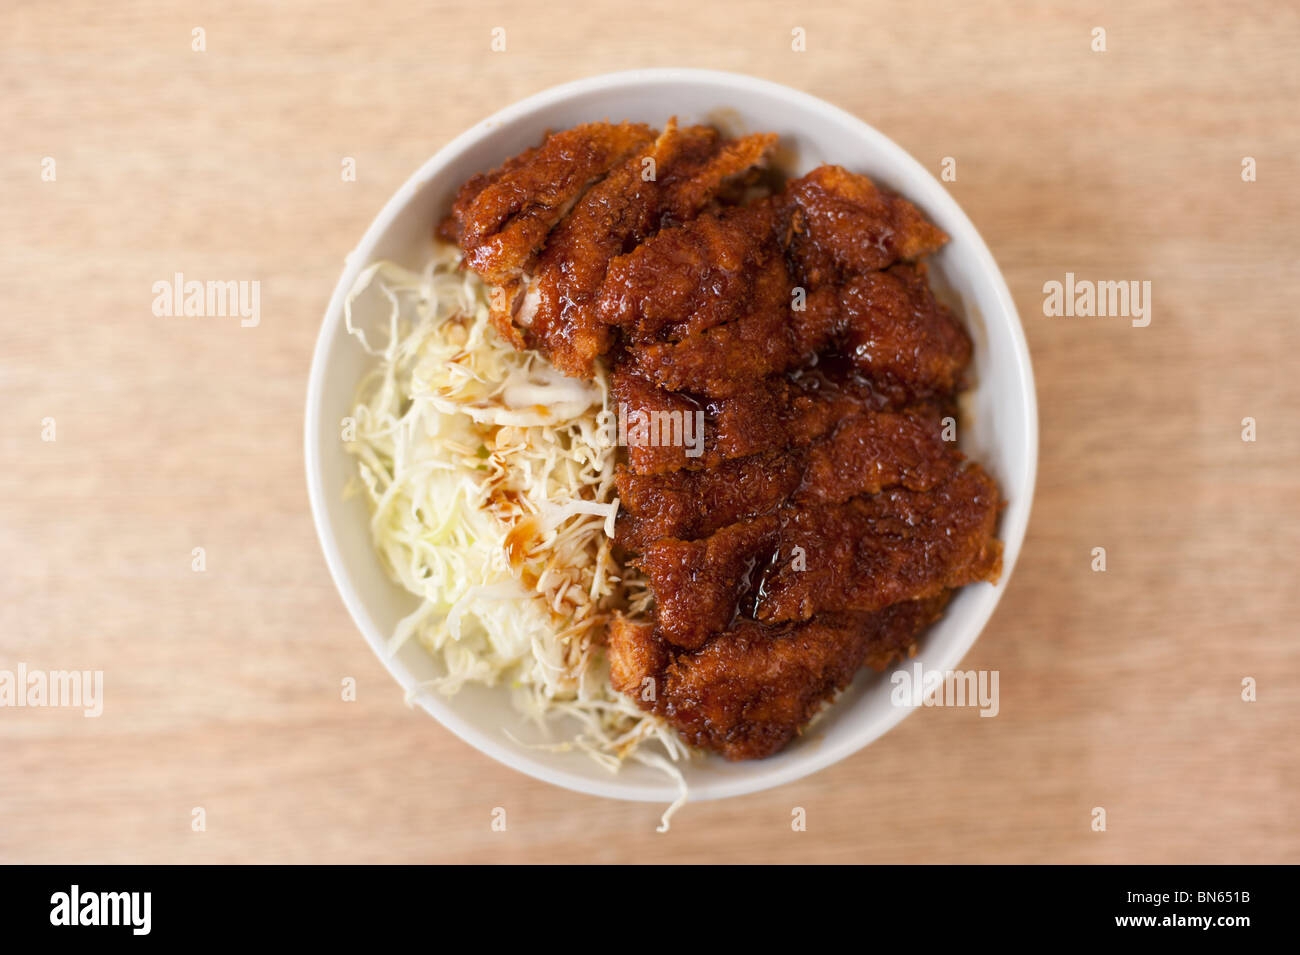 how to cook katsu chicken